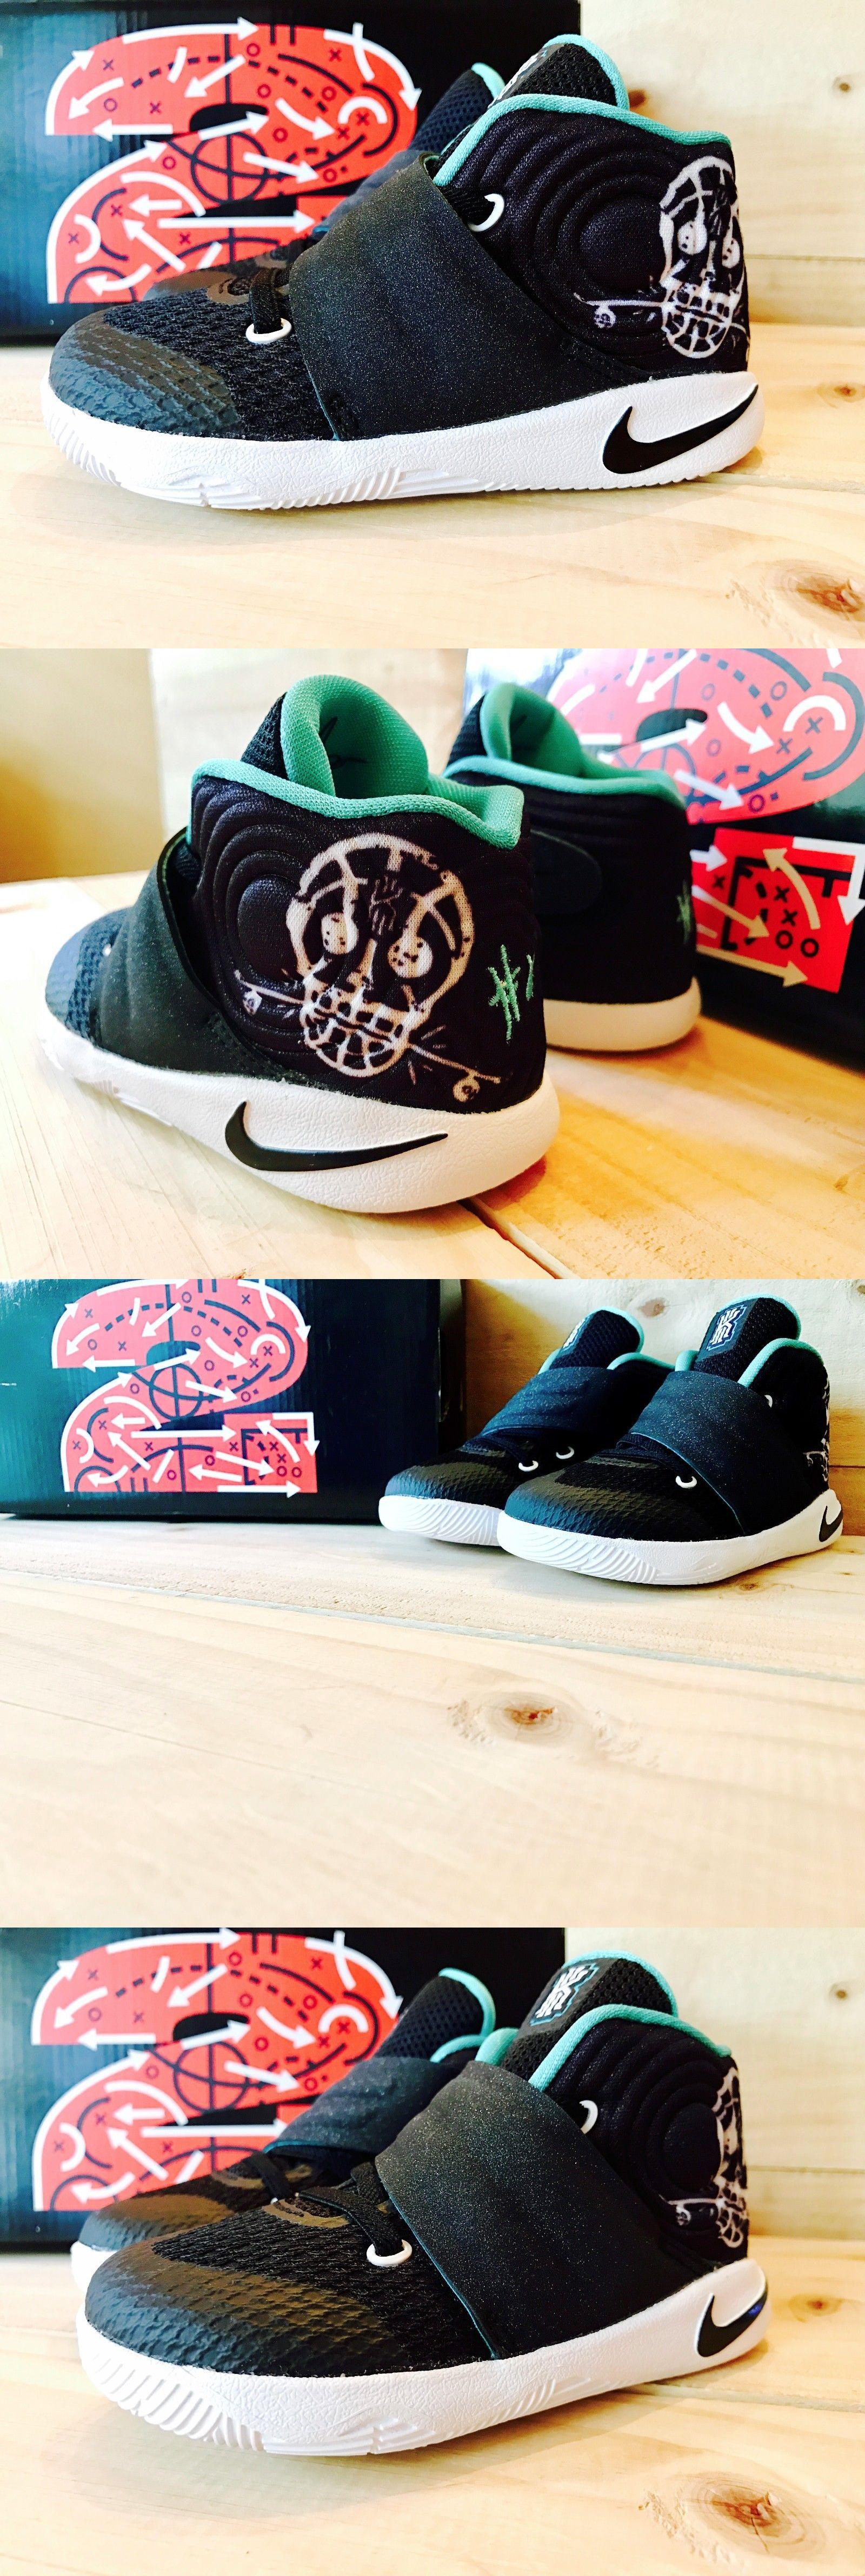 Baby Shoes 147285: Nike Kyrie 2 Court Deck Black + Hyper Jade Teal Toddler  Boys